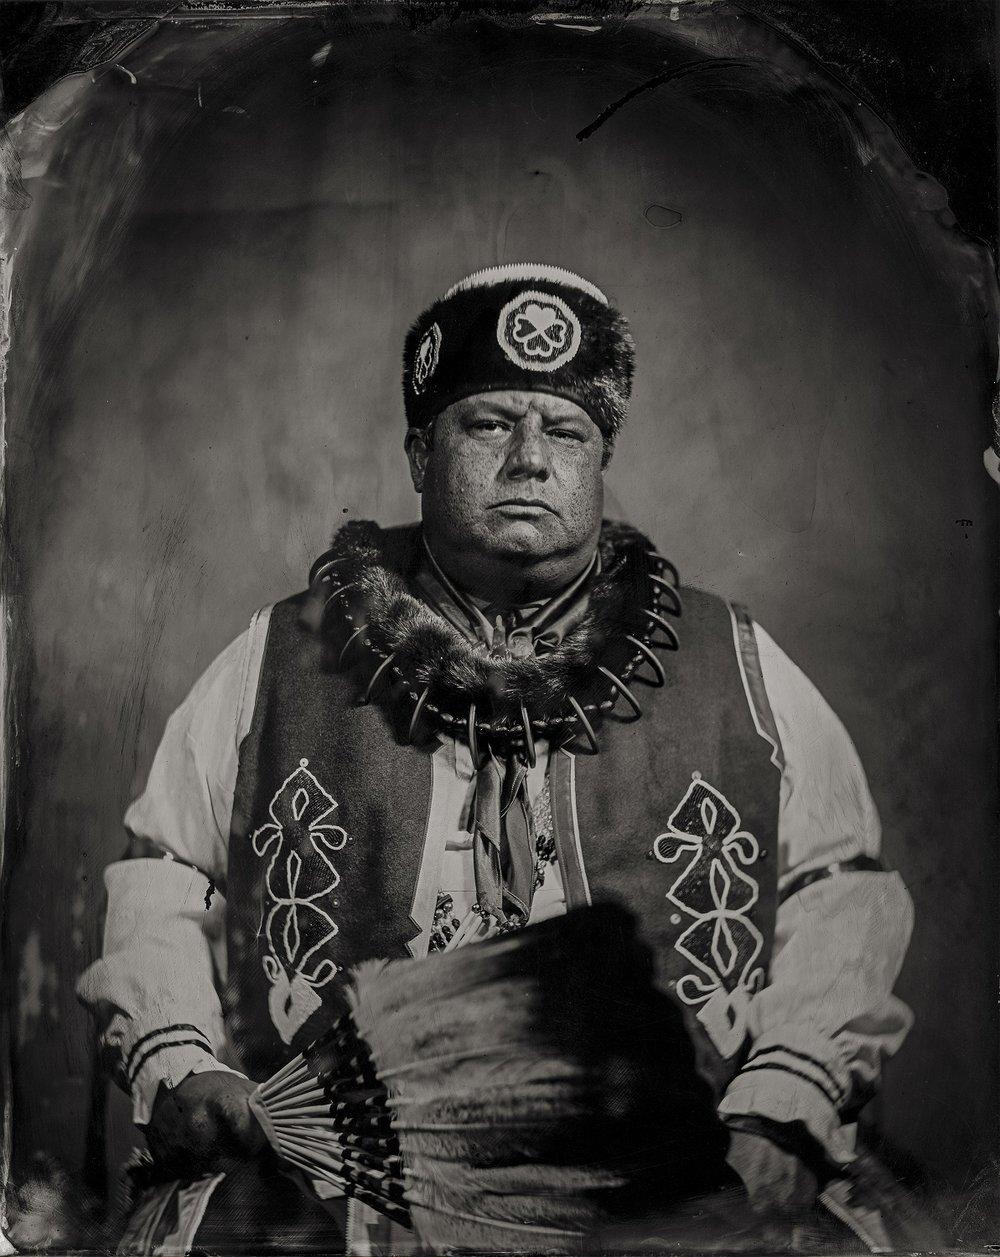 Will Wilson, Chairman John Shotton, citizen of Otoe-Missouria Tribe and affiliated Iowa, 2016